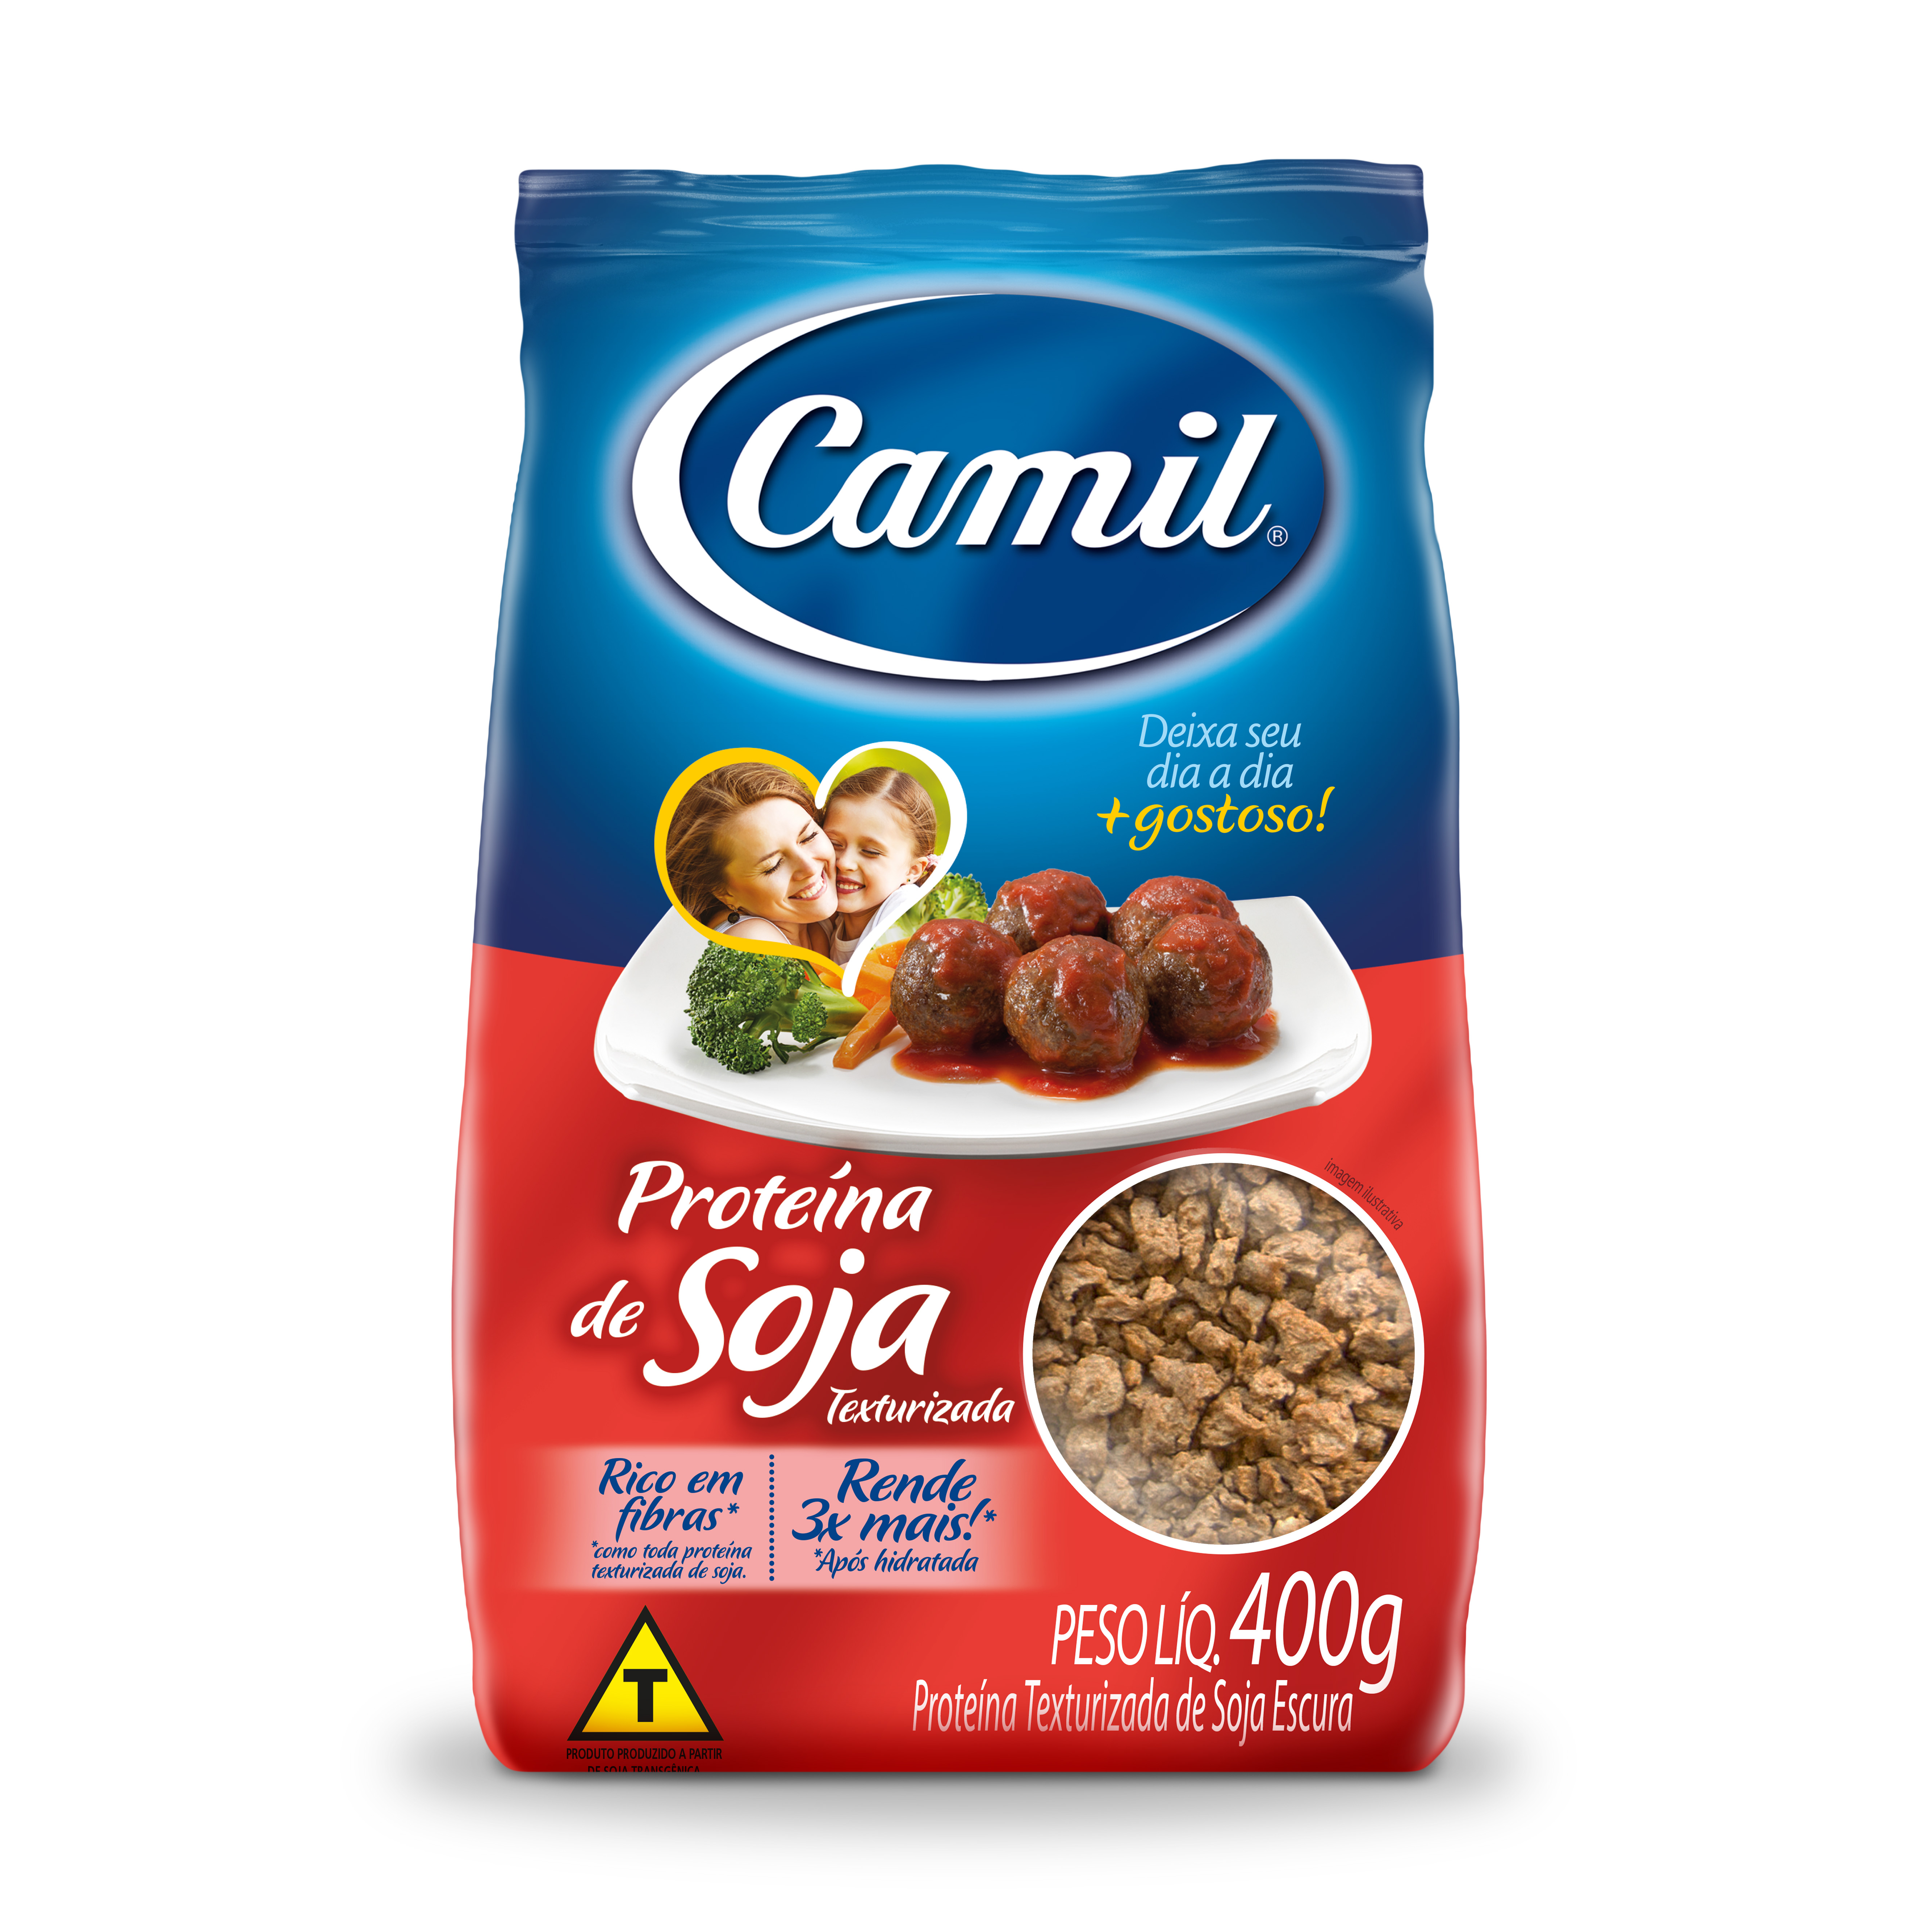 Proteína Texturizada de Soja para Carnes